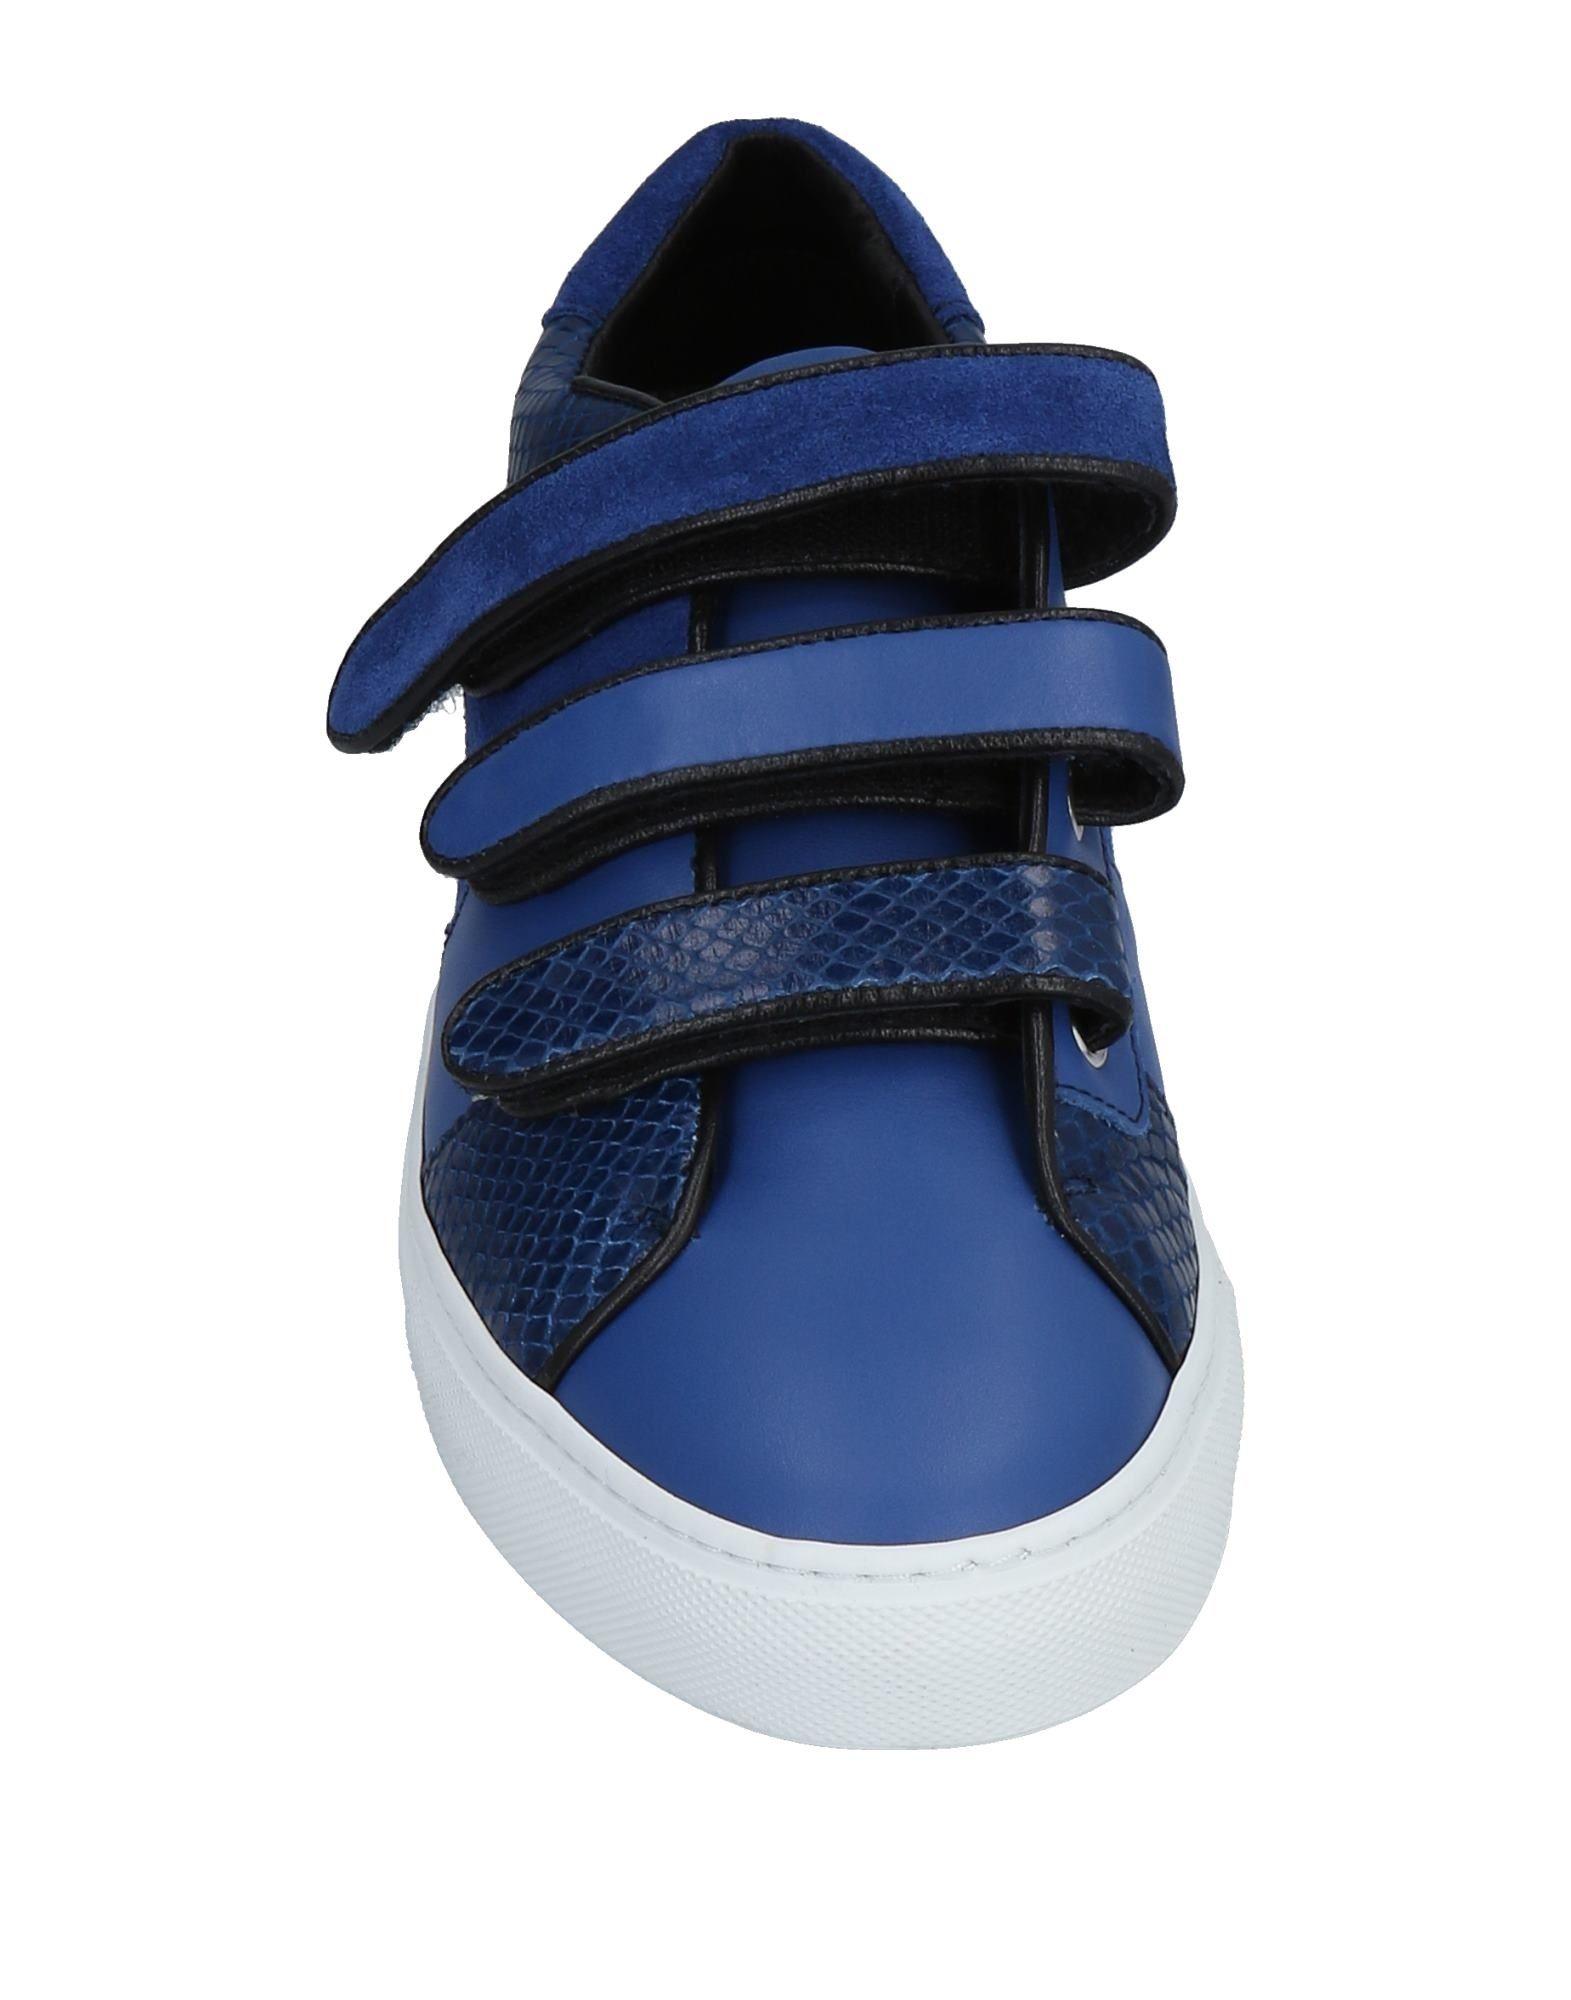 Just Cavalli Sneakers Herren  11473099PA Gute Qualität beliebte Schuhe